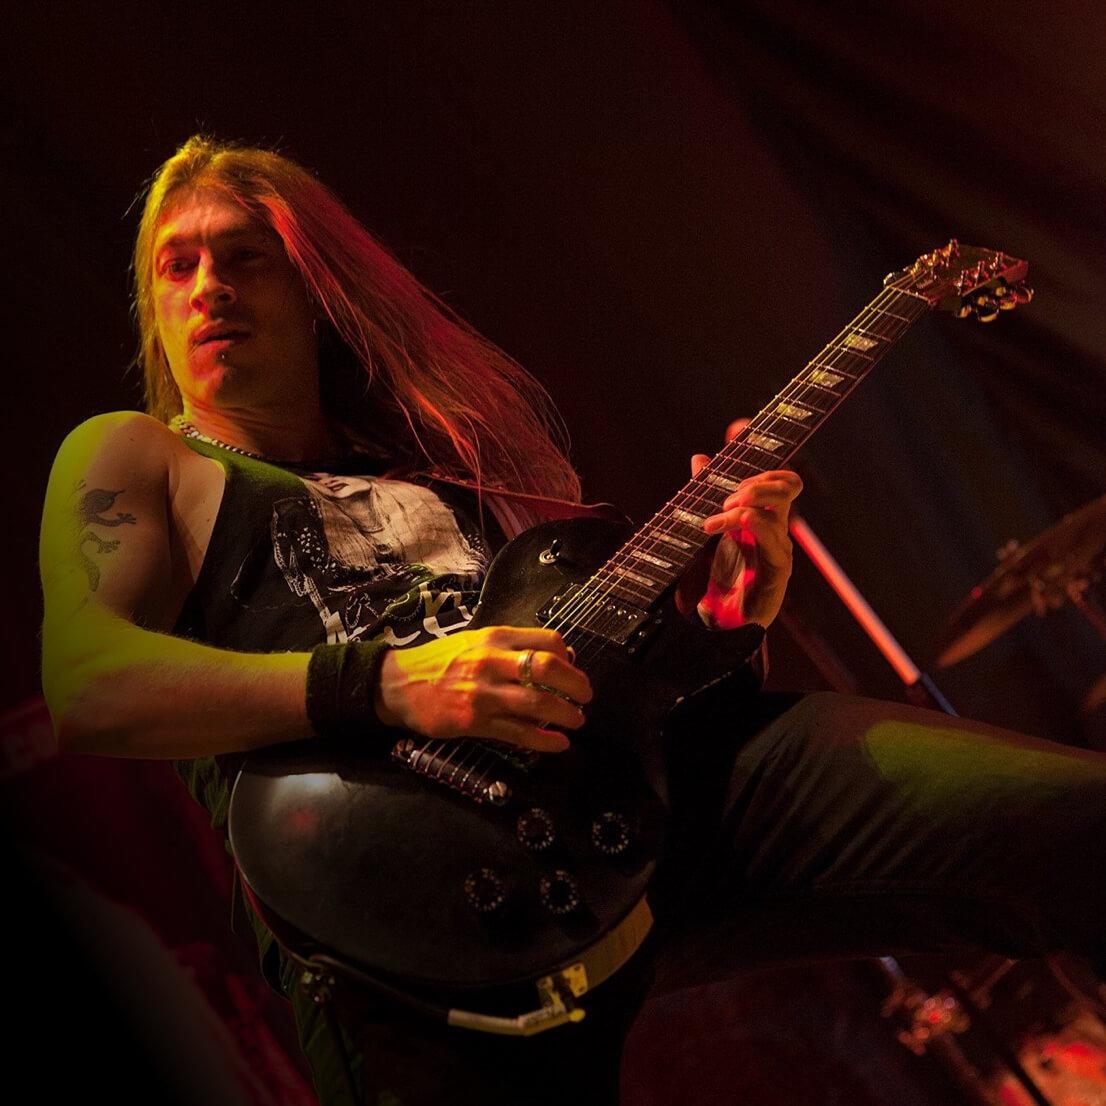 Tech copywriter Jon Evans playing the guitar on stage